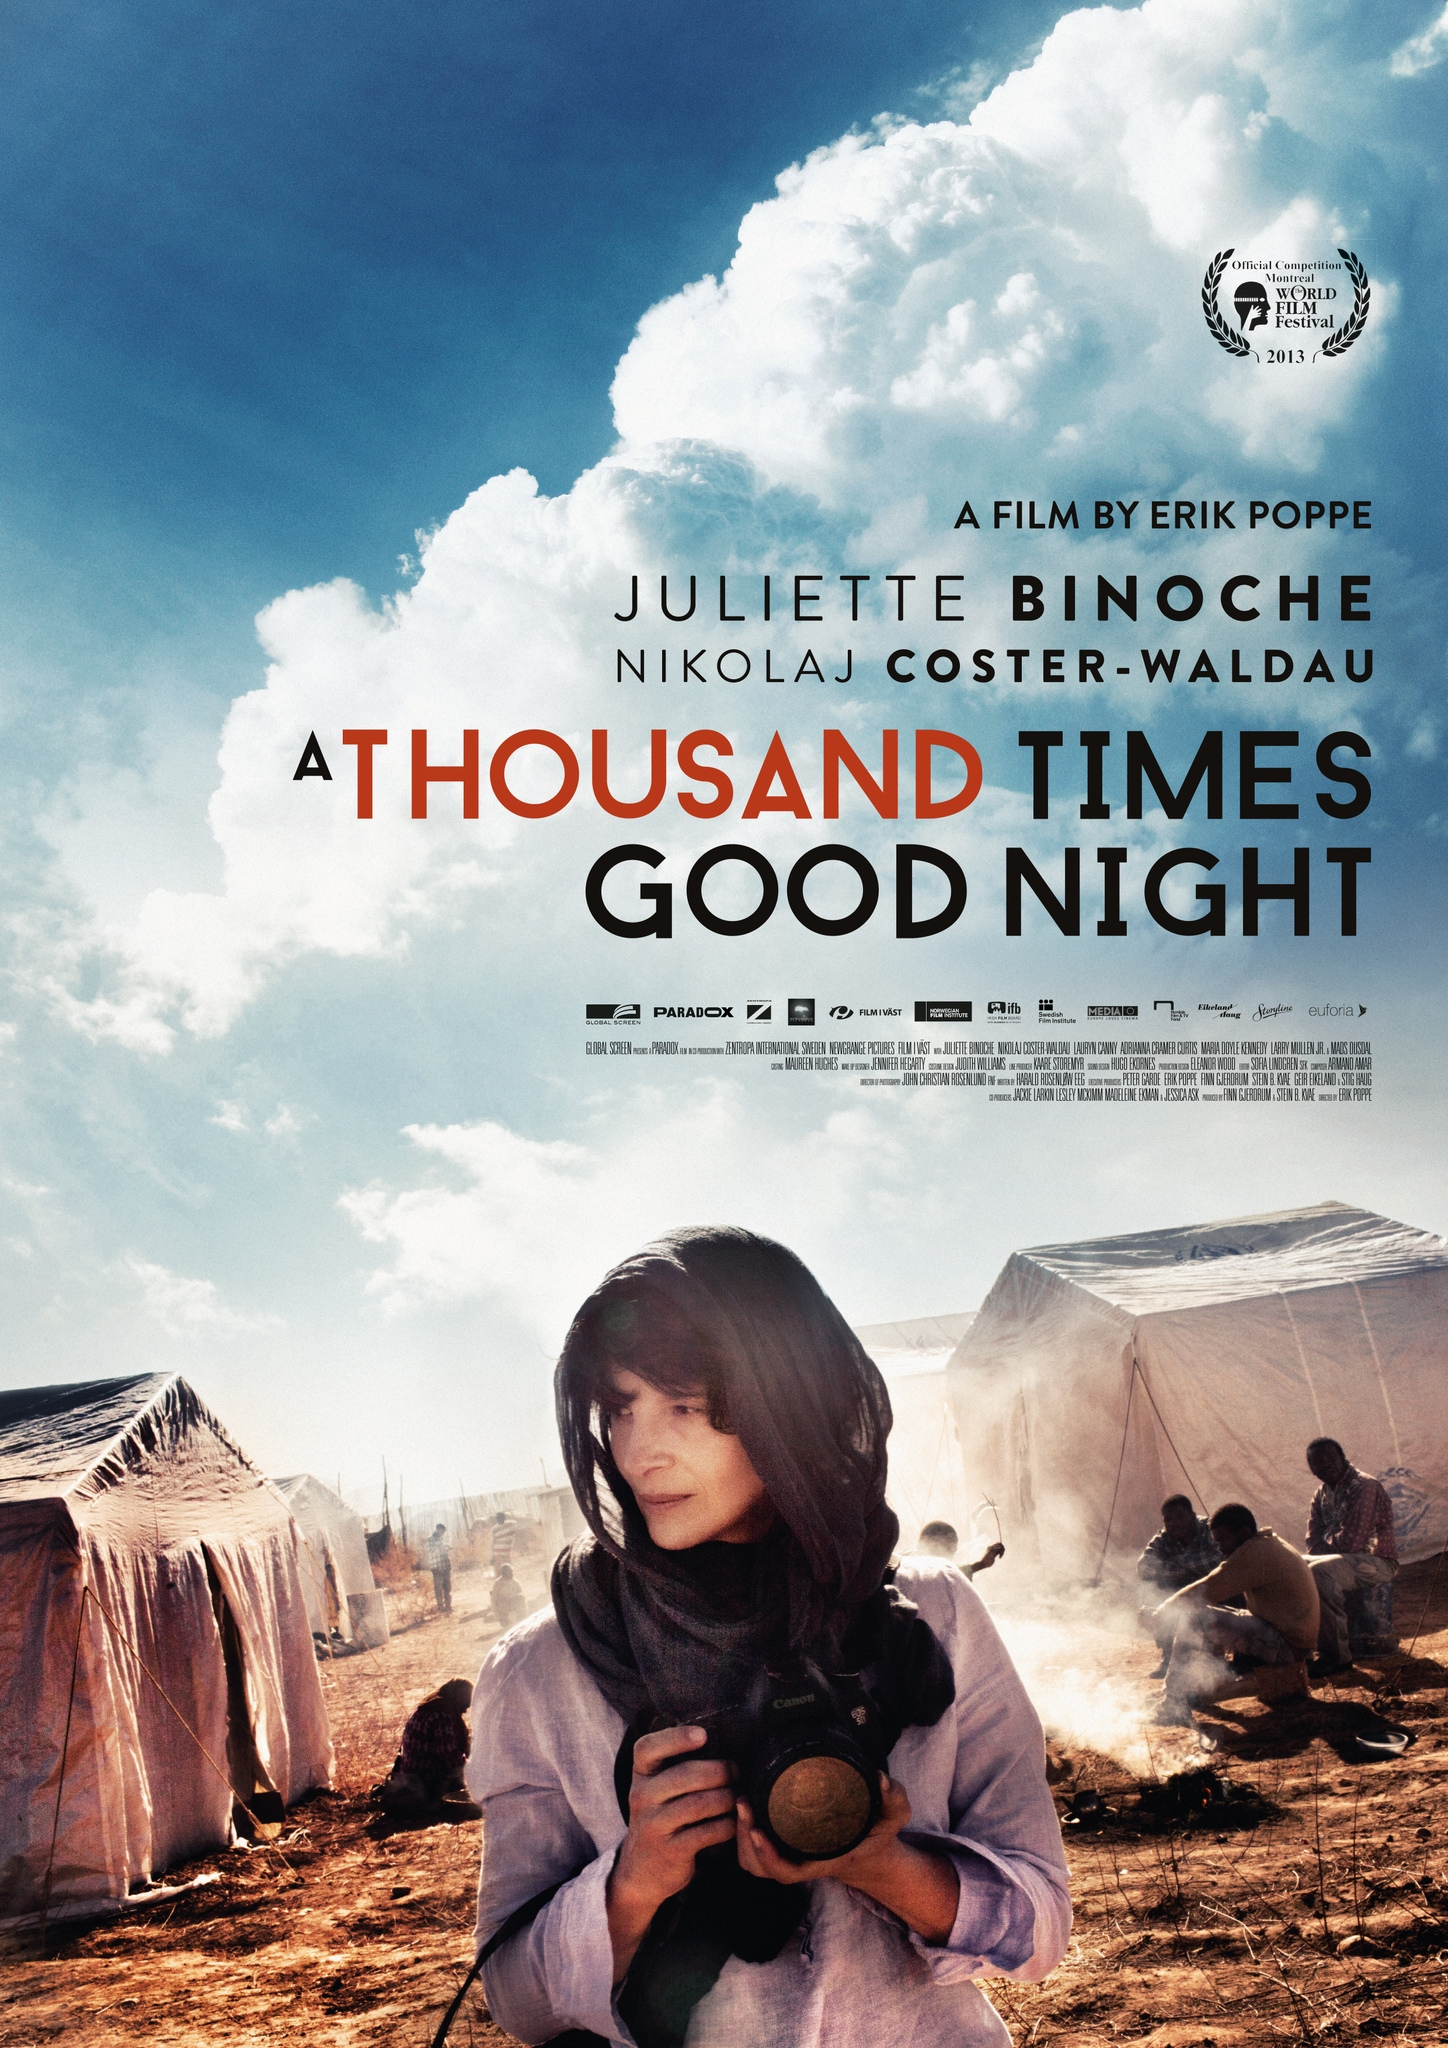 La locandina di A Thousand Times Good Night